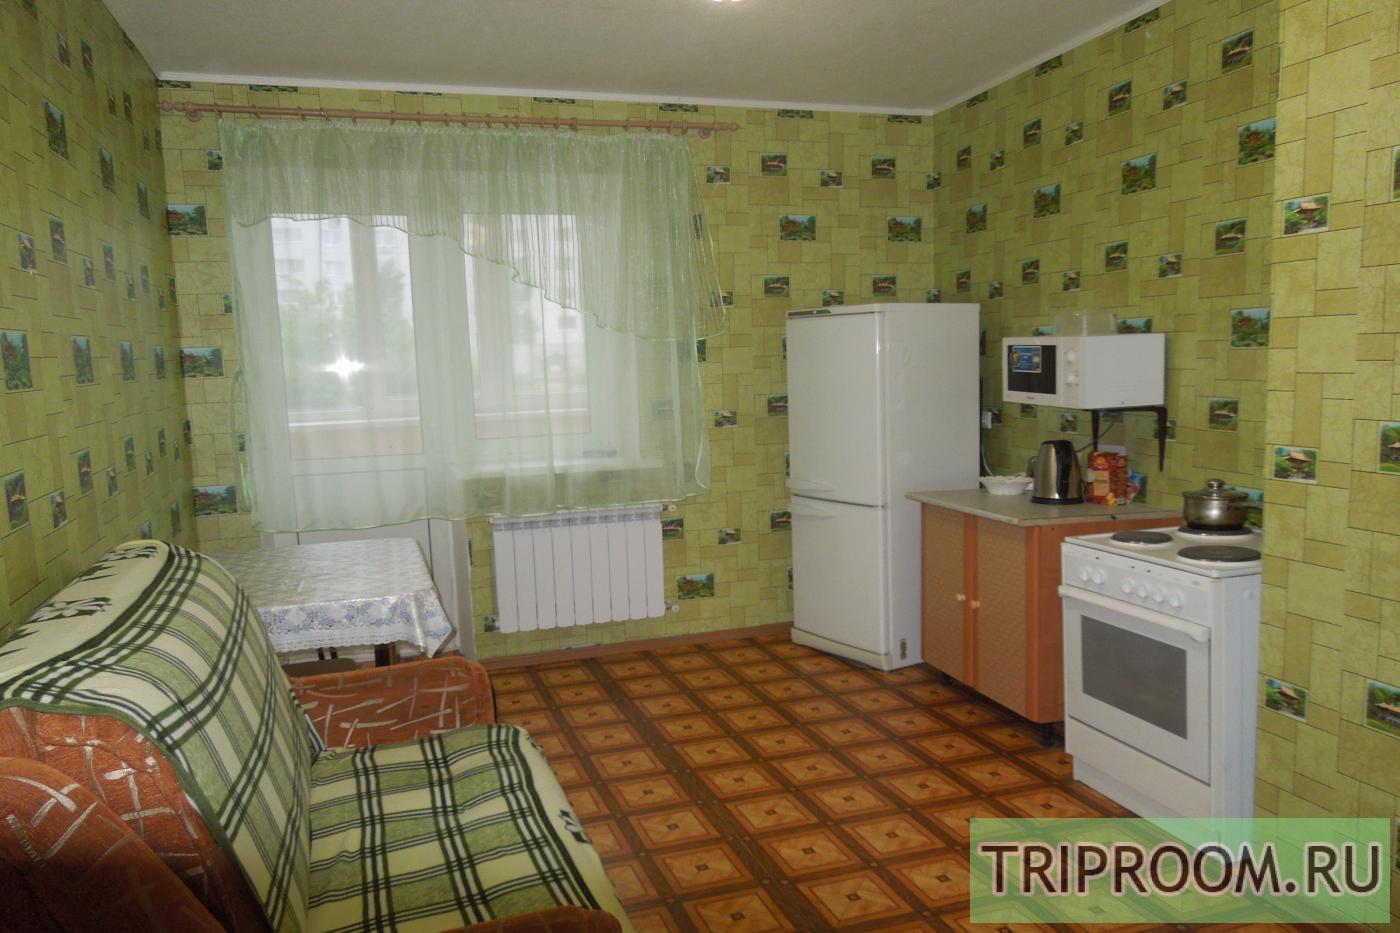 1-комнатная квартира посуточно (вариант № 1933), ул. Краснознаменная улица, фото № 1